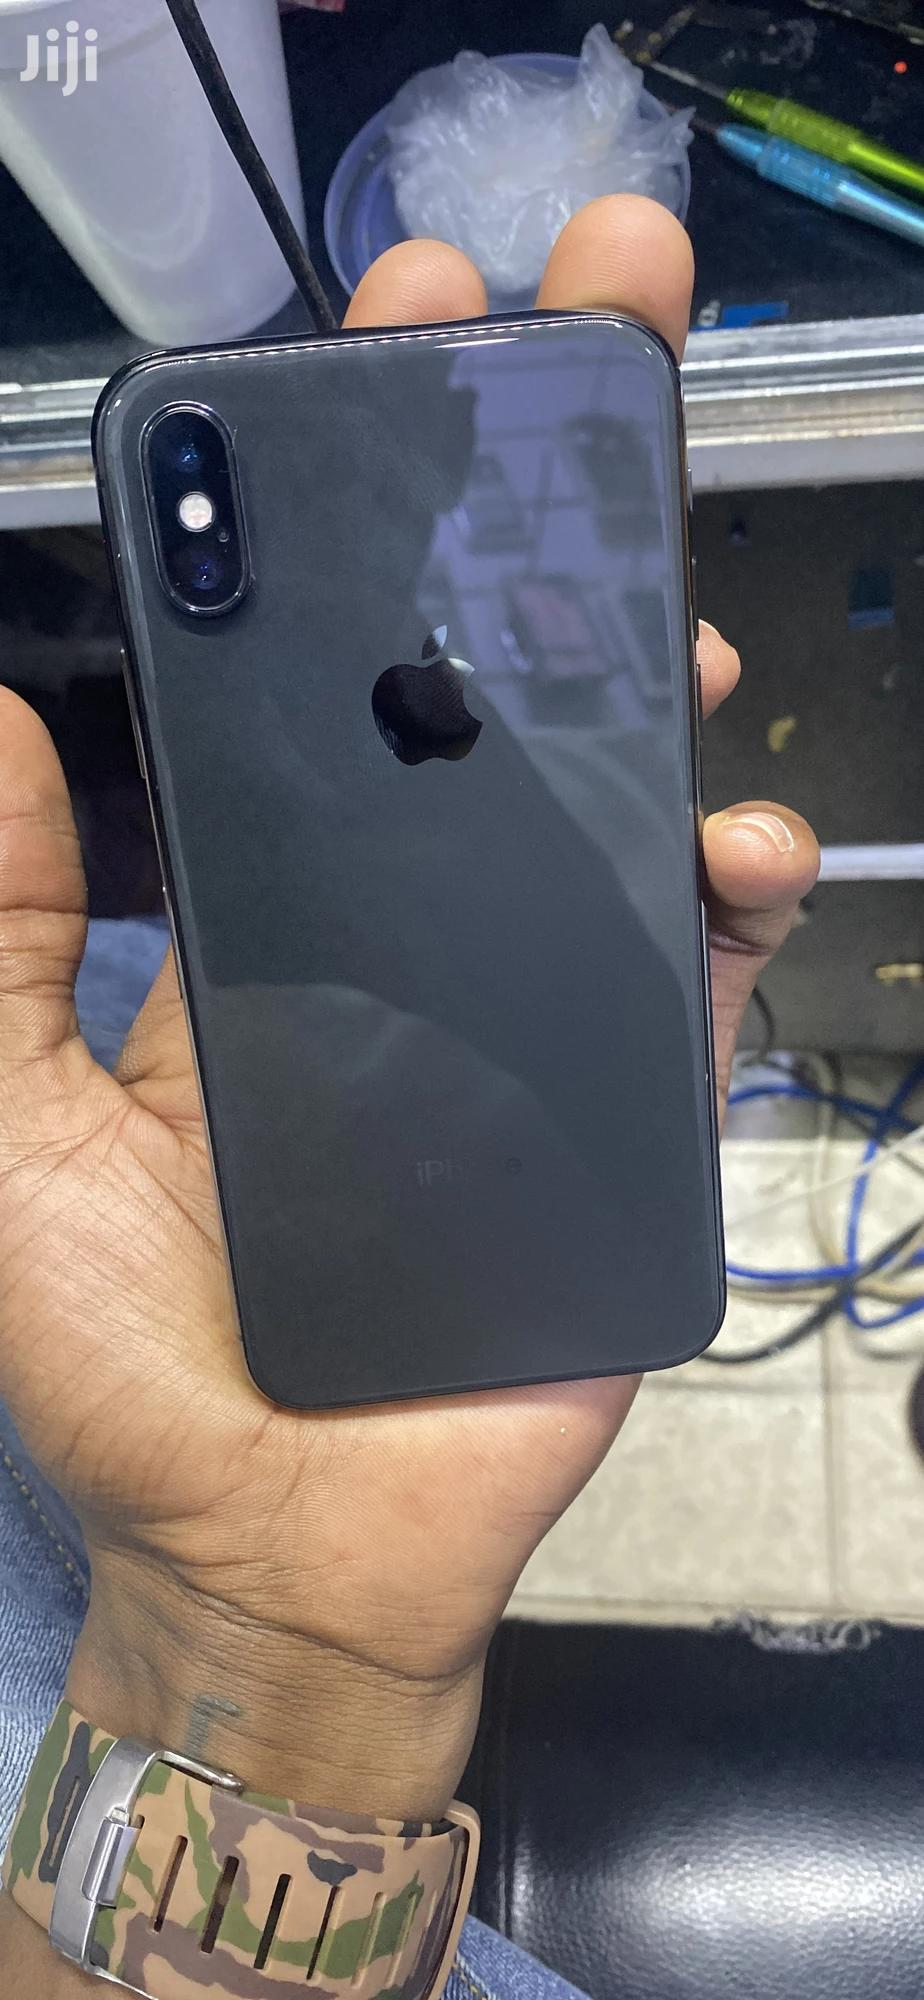 Apple iPhone X 64 GB Gray